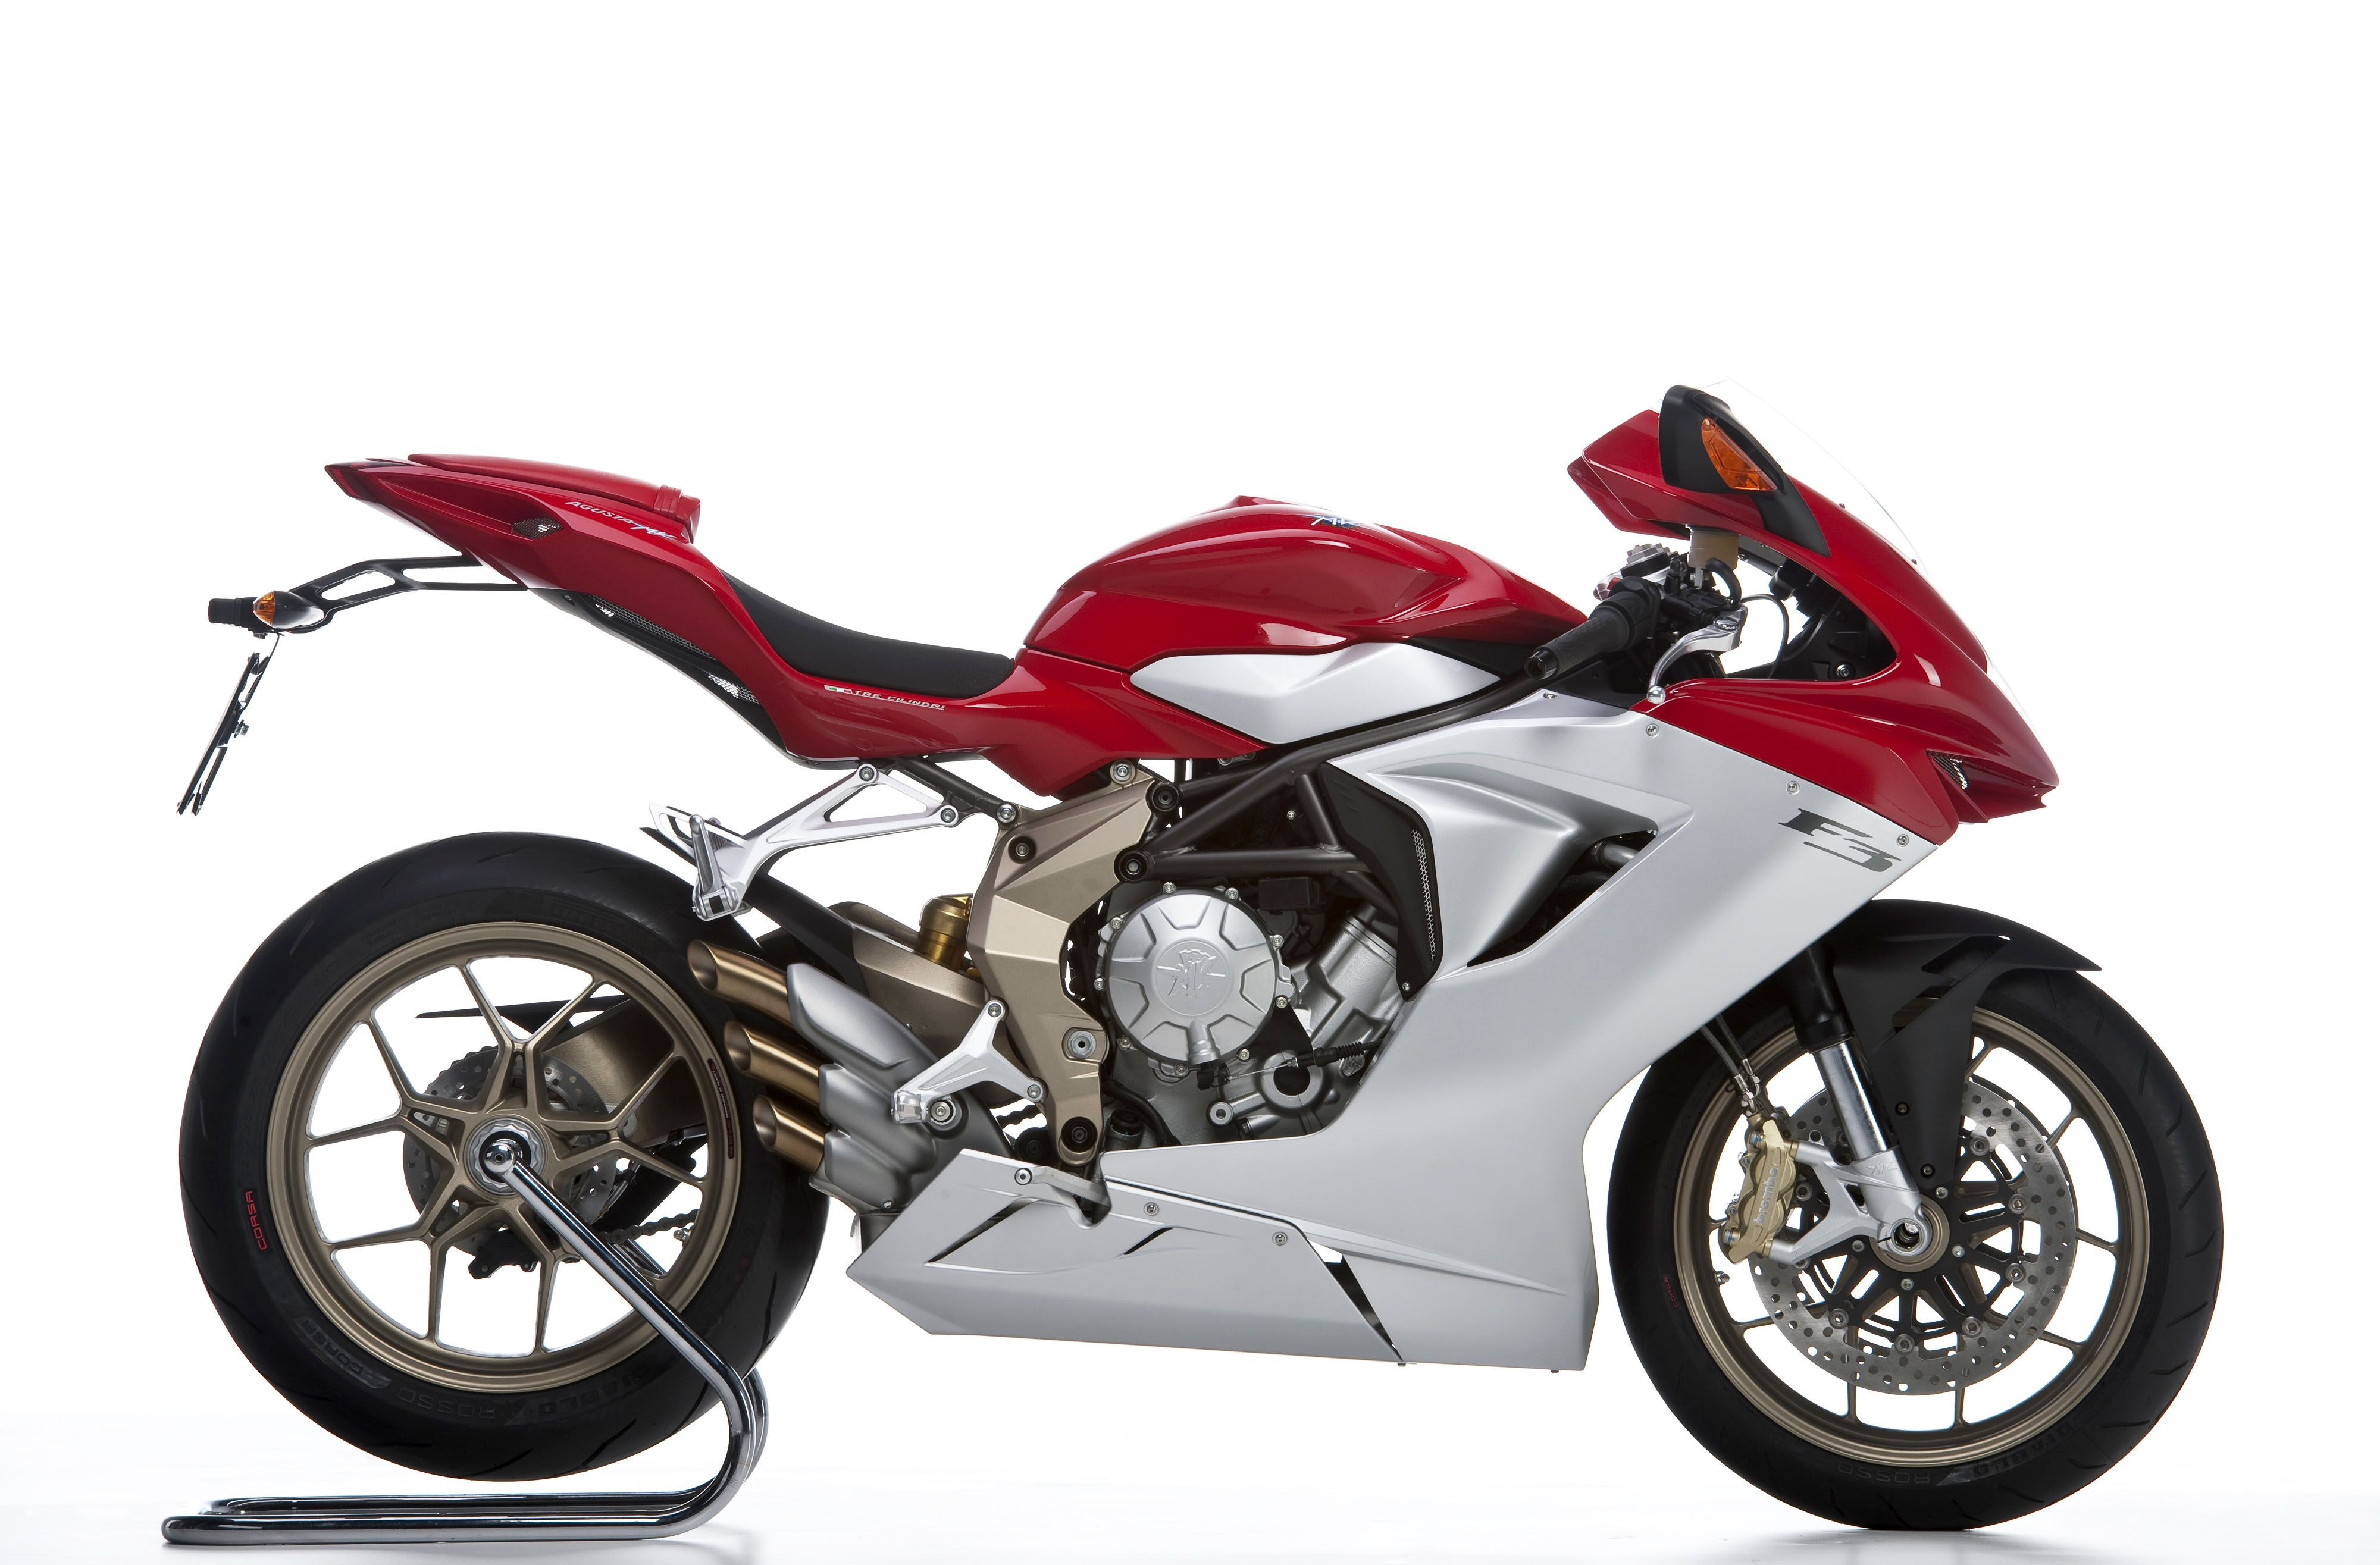 MV Agusta F3 | Moto | Pinterest | MV Agusta, Cars and Vehicle